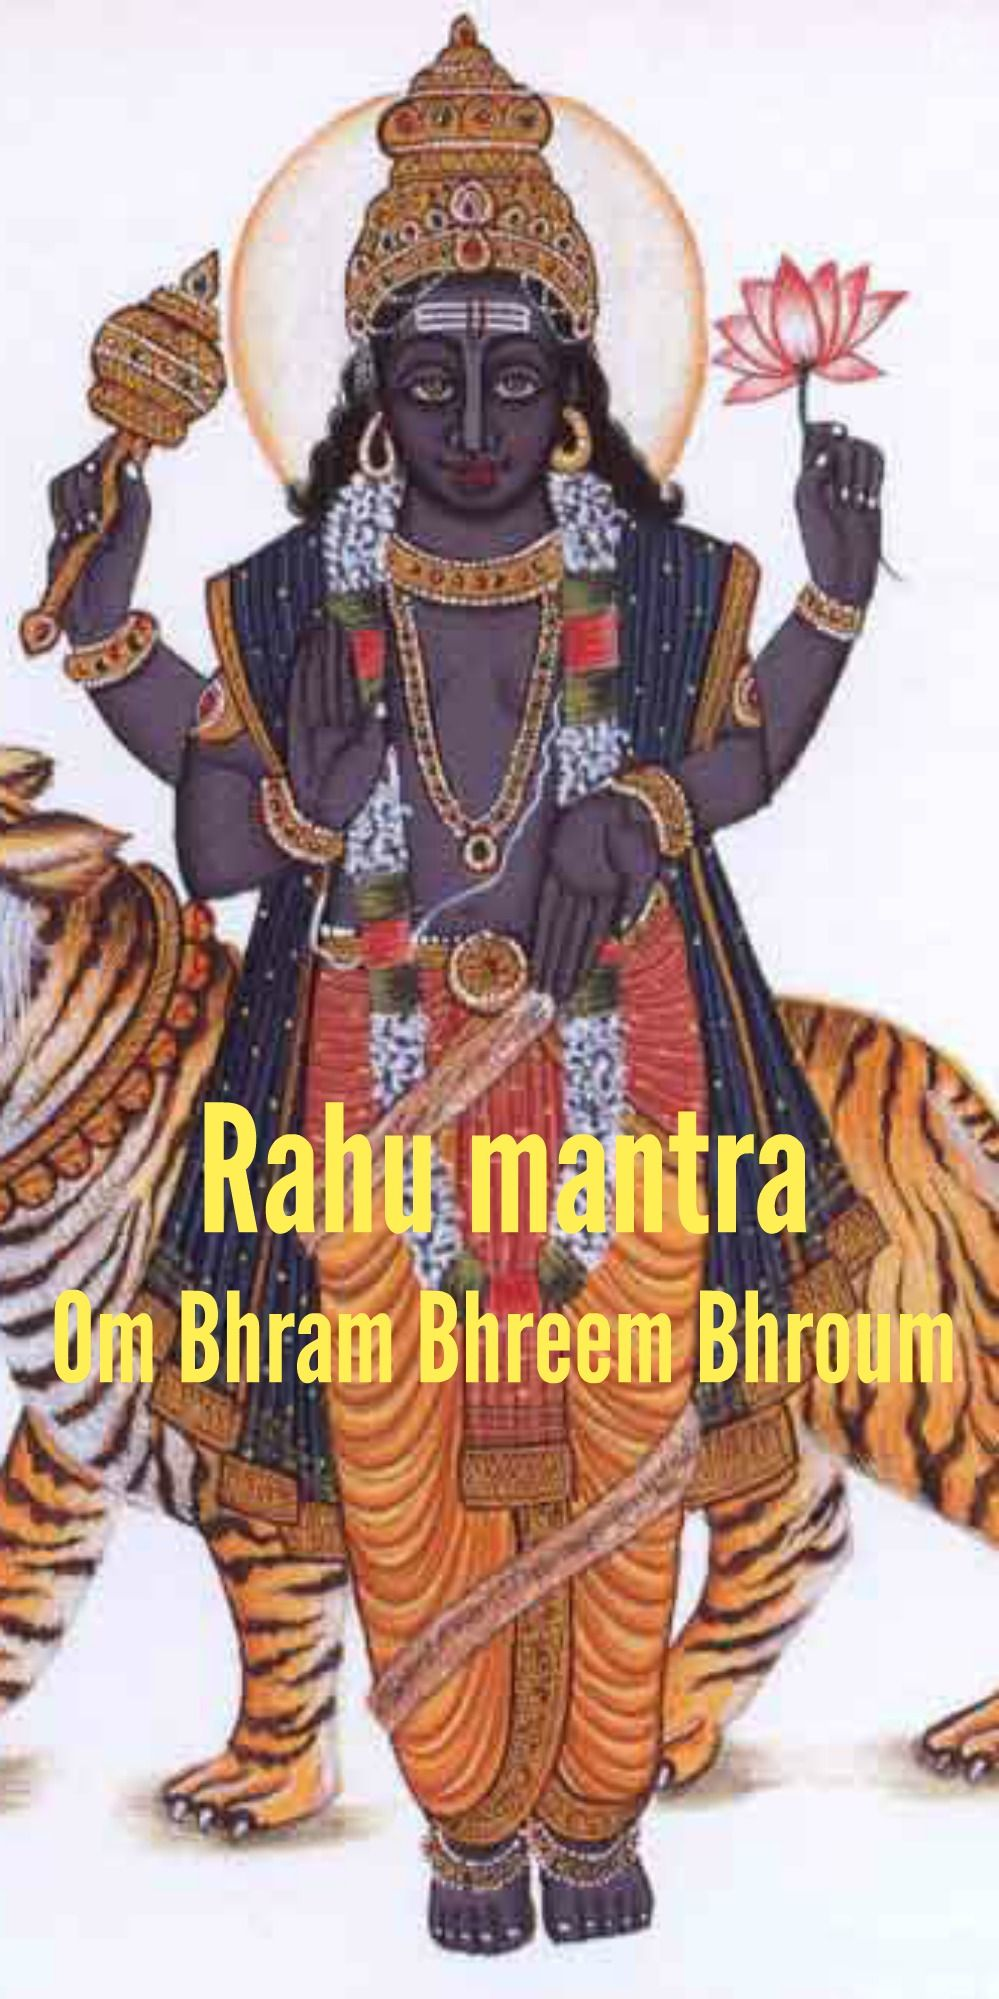 Rahu mantra - Om Bhram Bhreem Bhroum: Lyrics, Meaning and Benefits